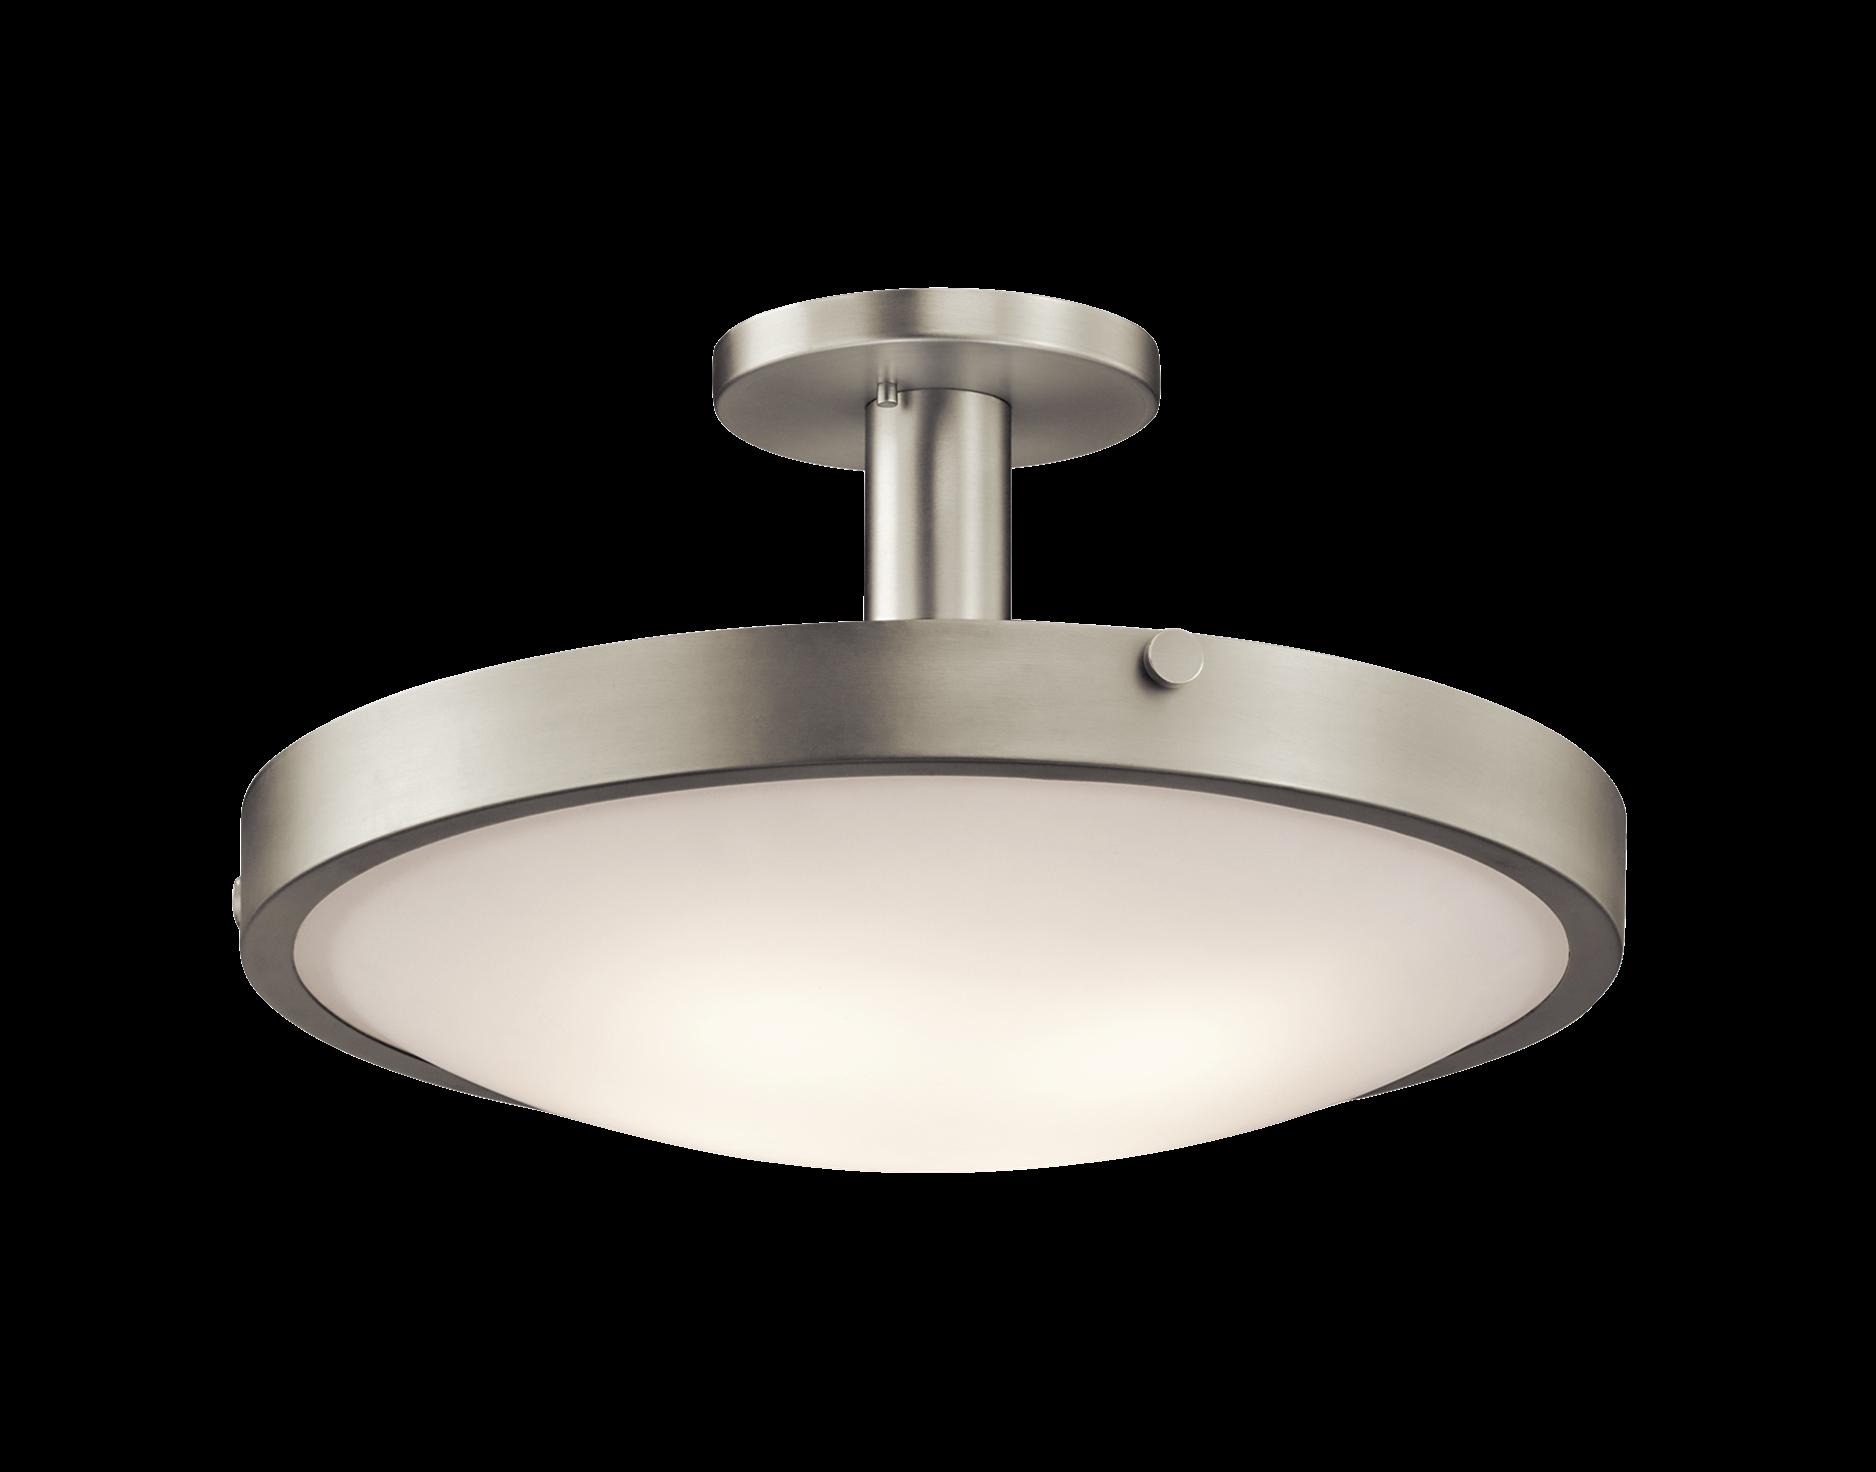 Semi flush 4lt ni lamps and lighting pinterest ceiling fans semi flush 4lt ni landscape lightingkitchen lightingbrushed nickelhallways aloadofball Images